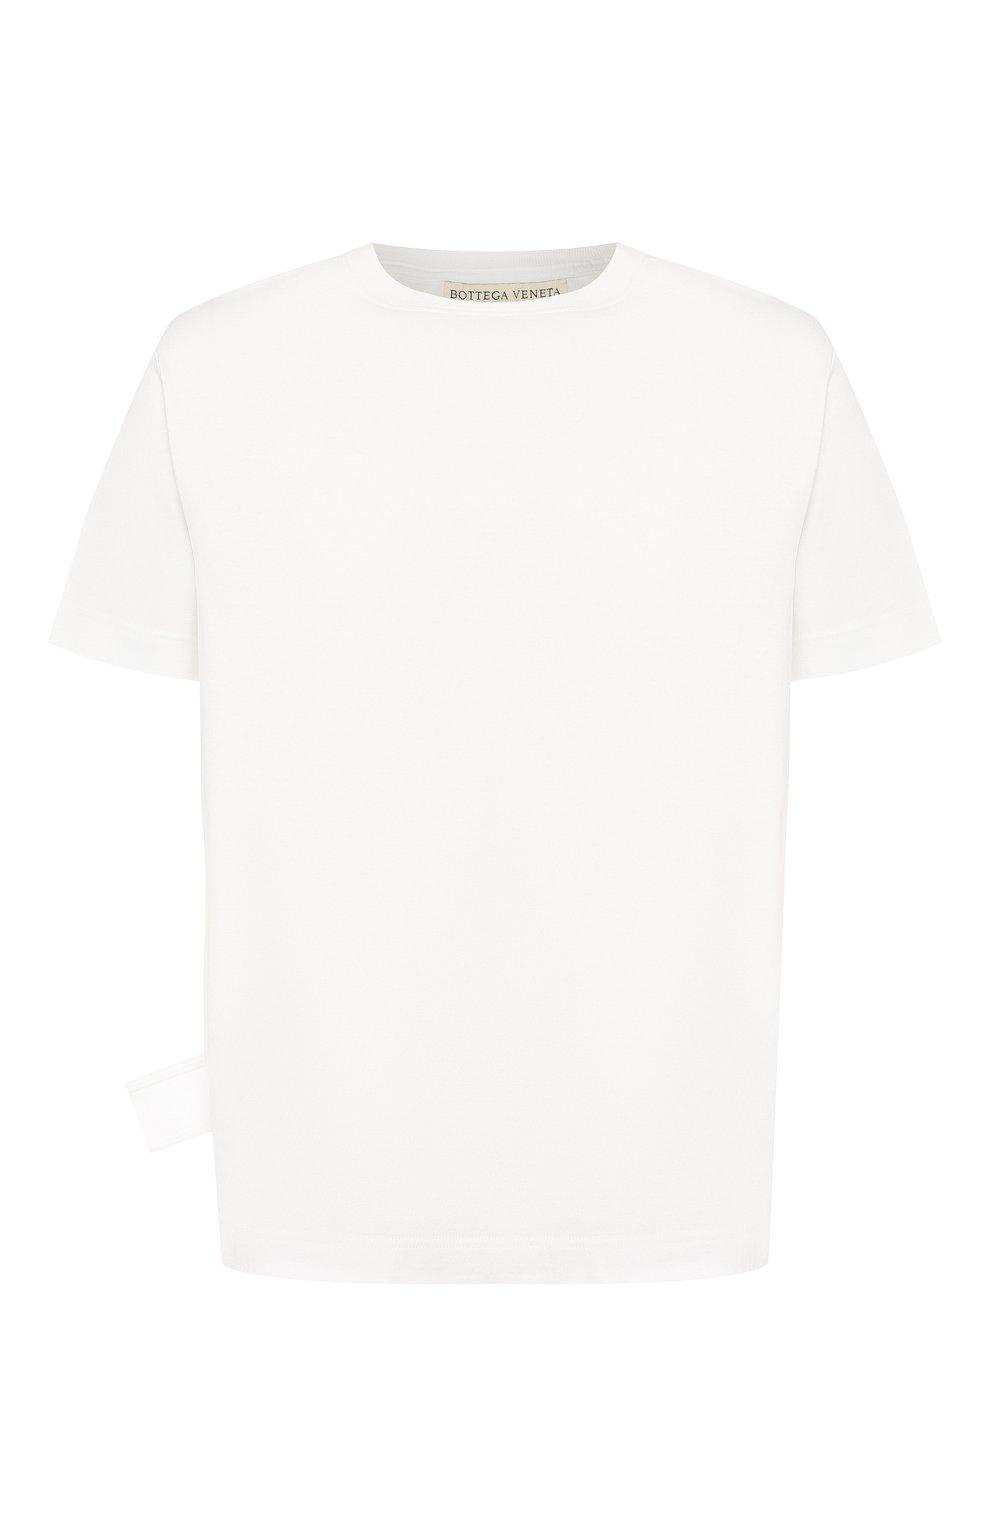 Мужская хлопковая футболка BOTTEGA VENETA белого цвета, арт. 575589/VKAB0 | Фото 1